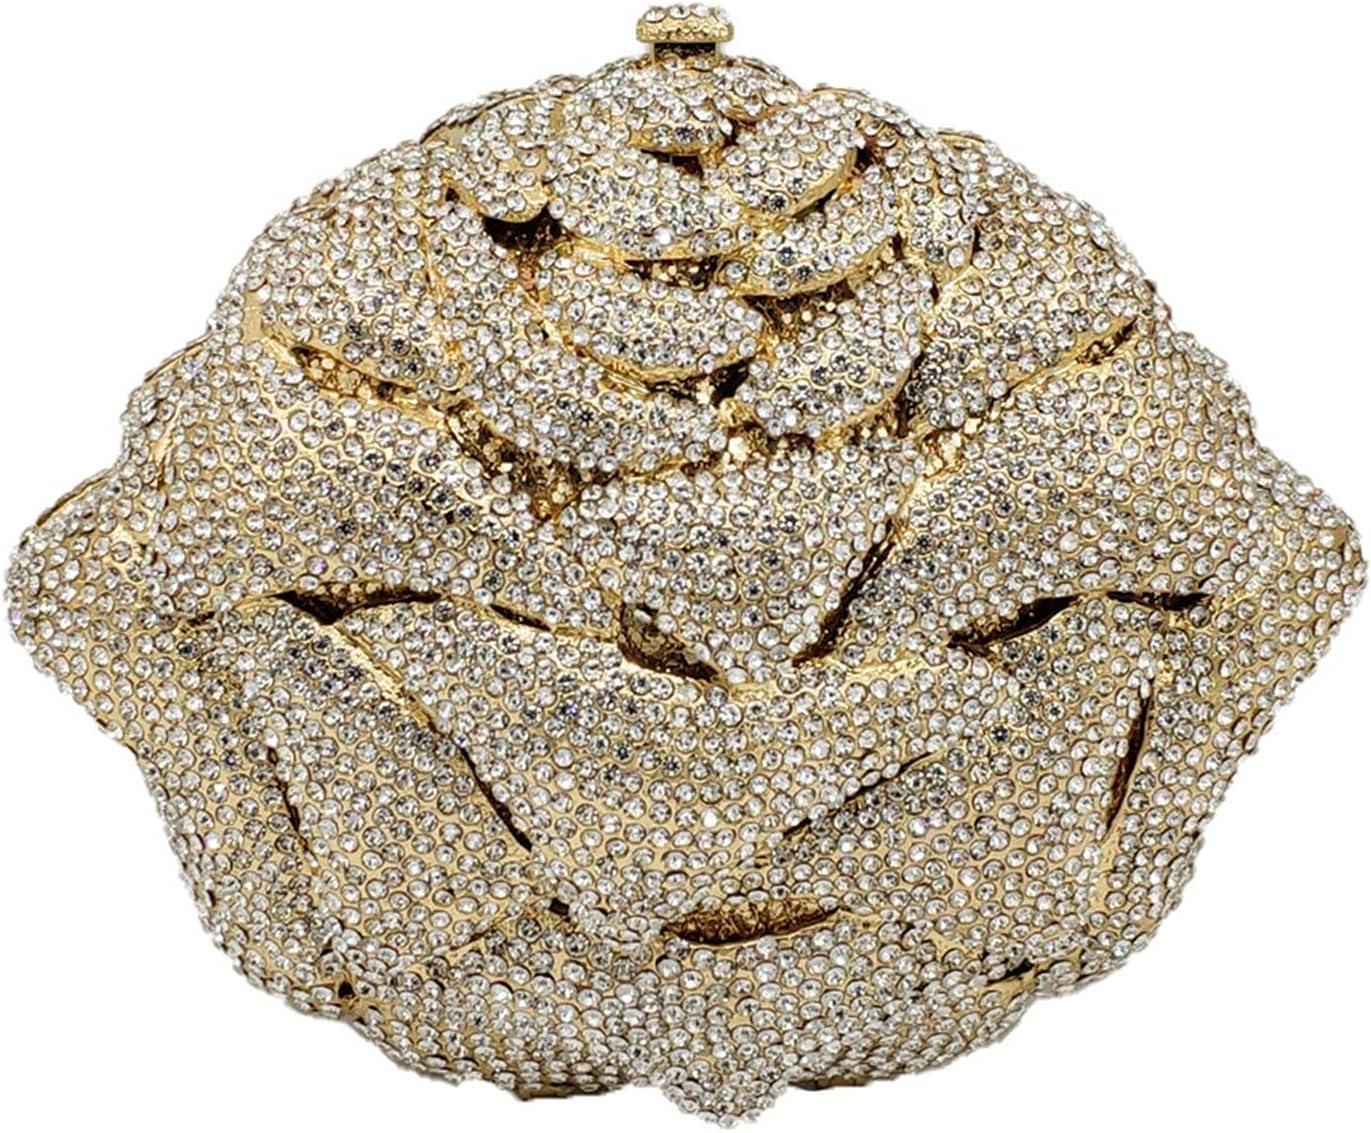 Women's Evening Bag Shiny Evening Bags Crystal Women Flower Clutch Bag Wedding Party Purse Bridal Diamond Floral Handbag (Color : Gold, Size : Small)